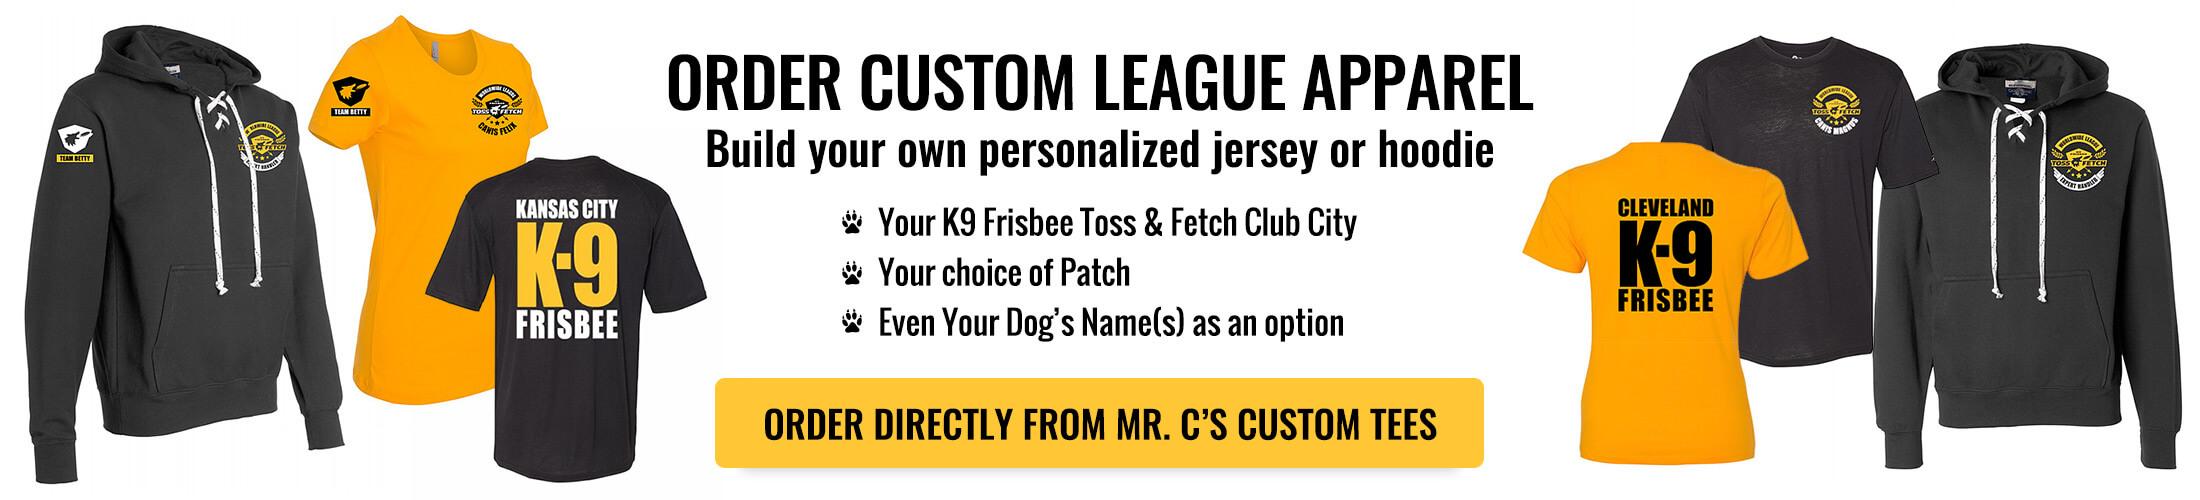 Order Custom League Apparel